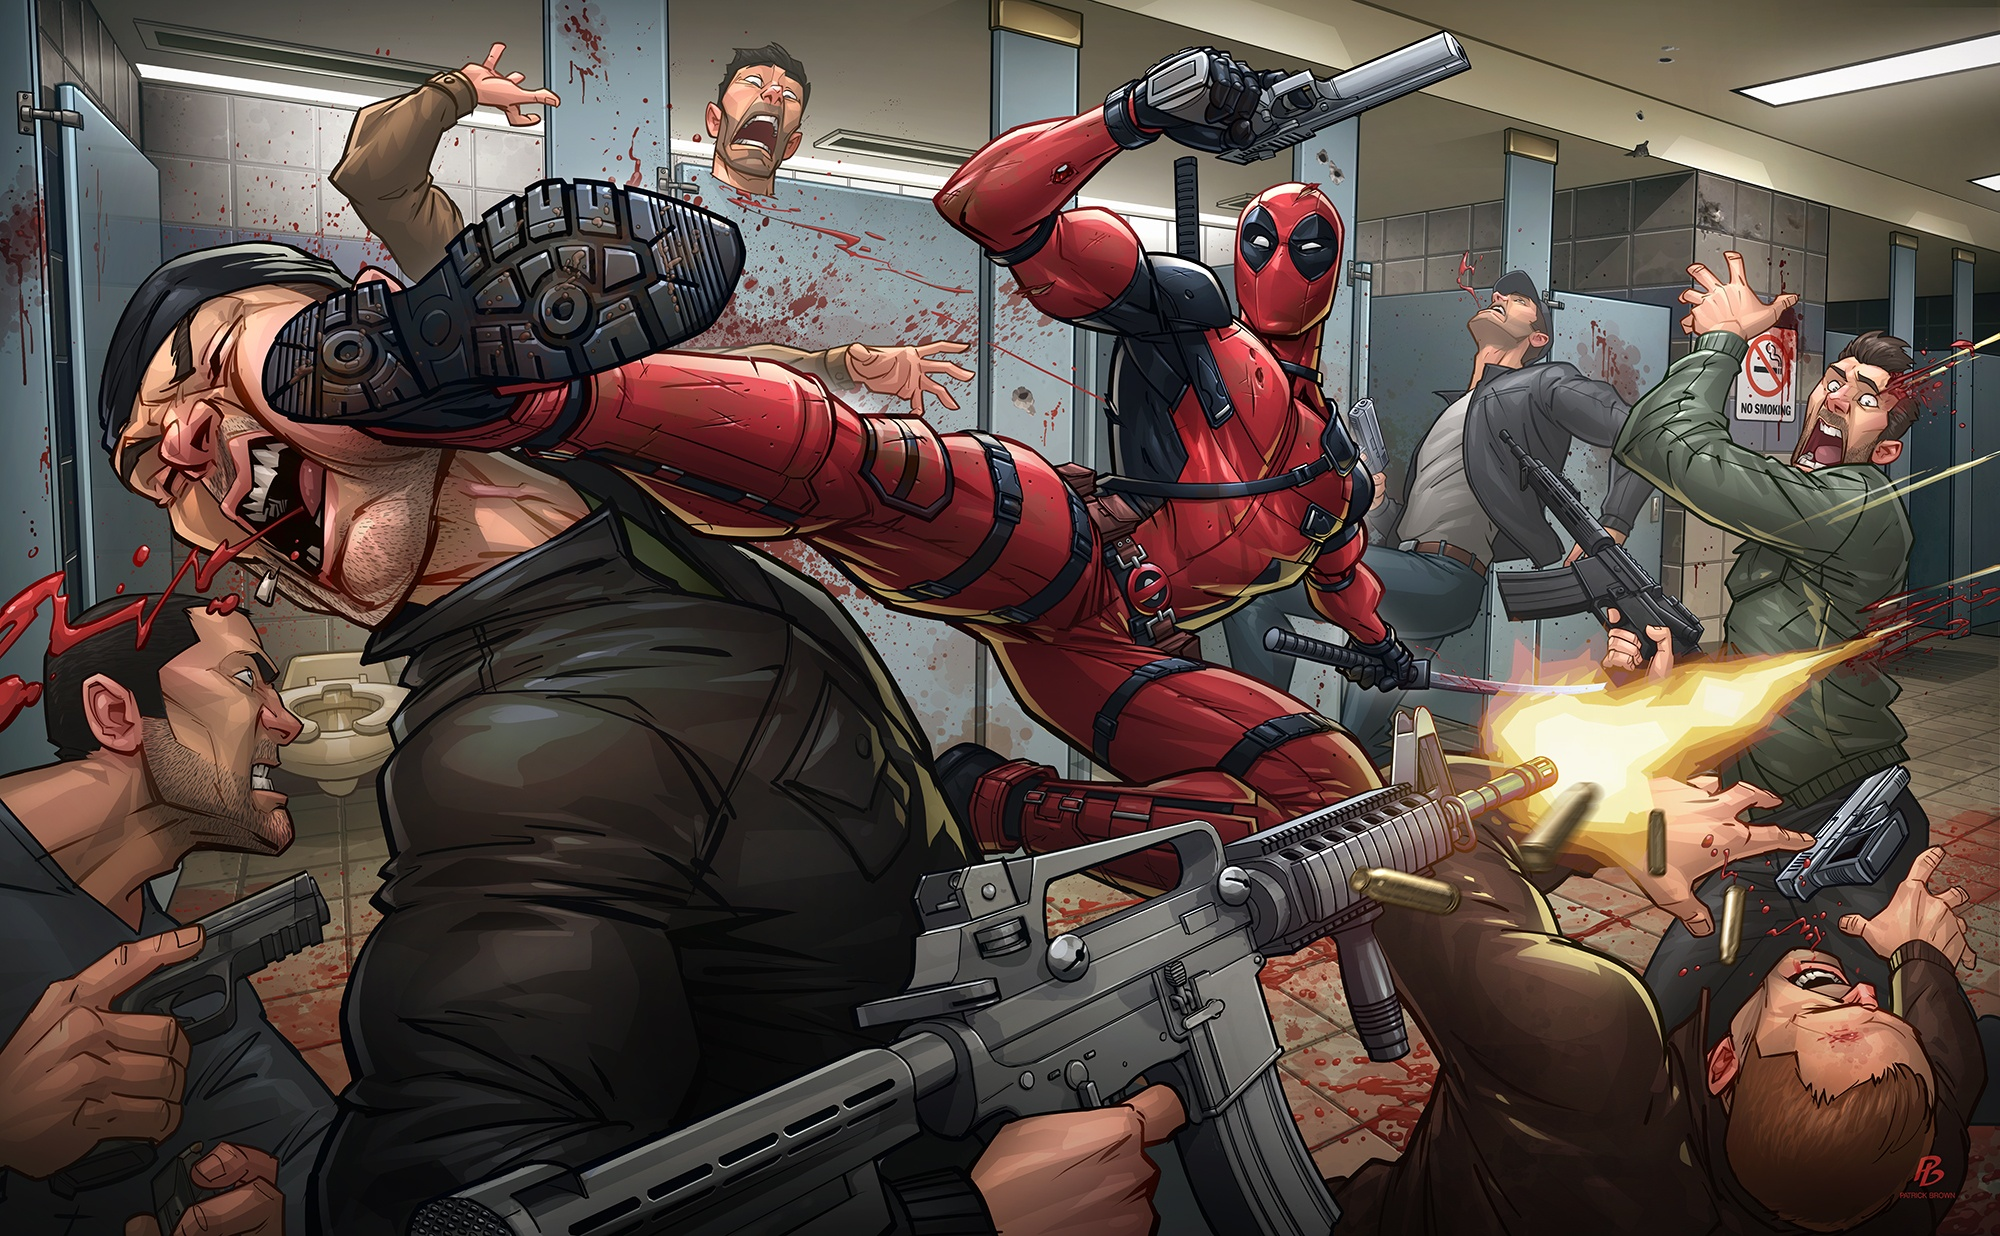 Deadpool 2 Fanart, HD Movies, 4k Wallpapers, Images ...